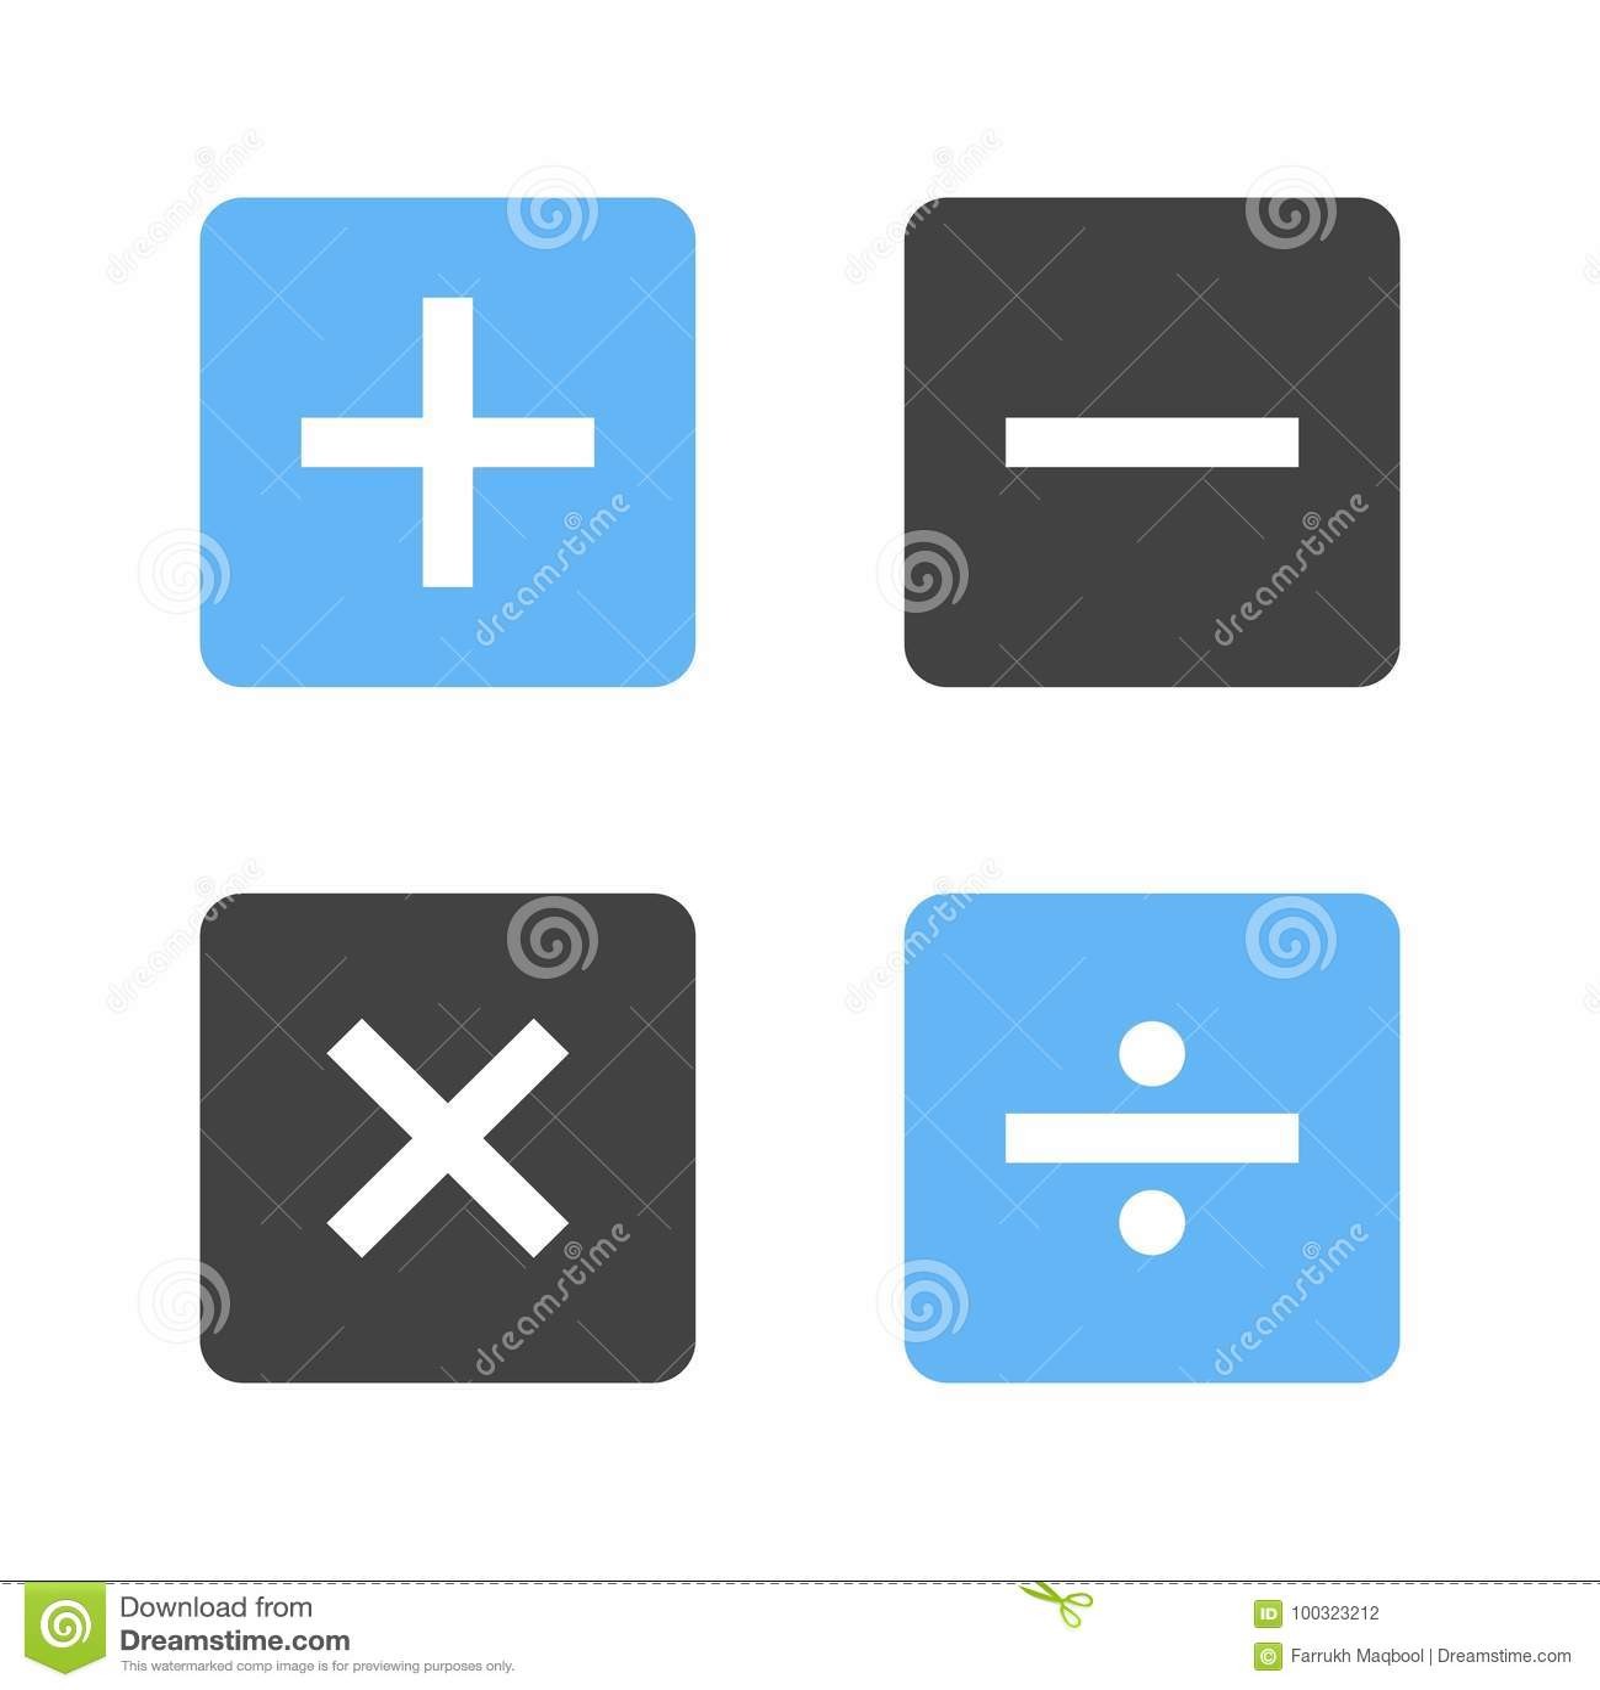 Math symbols ii stock vector illustration of learning 100323212 math symbols ii biocorpaavc Image collections